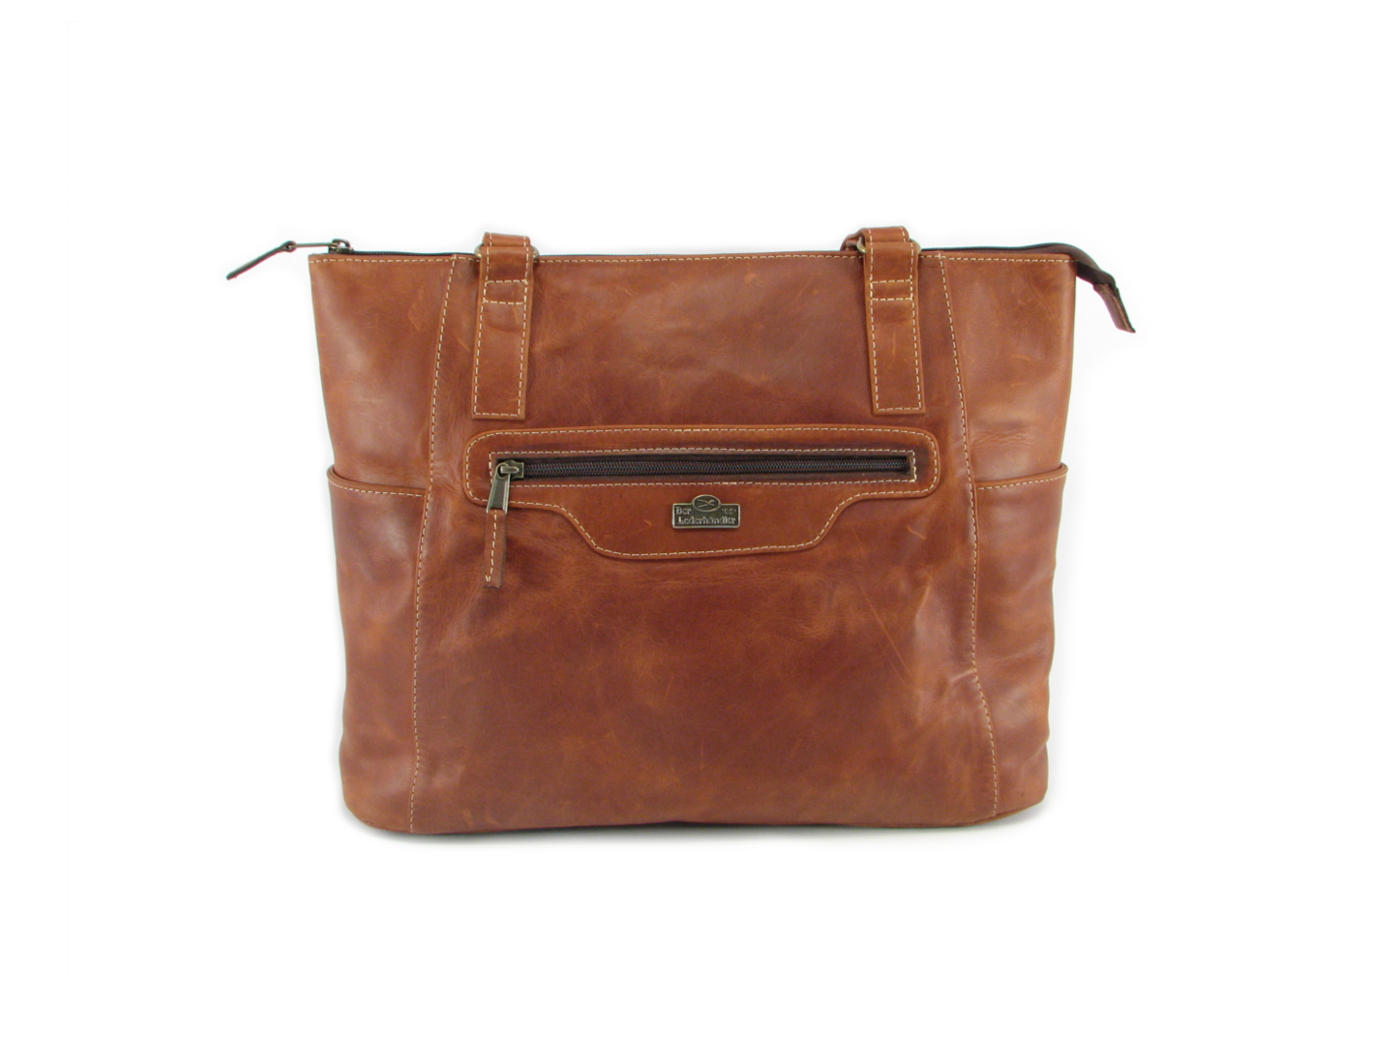 34962c0c3a38 Tosca No 1 HP7301 front classic handbag leather bags women, Der  Lederhandler, George,